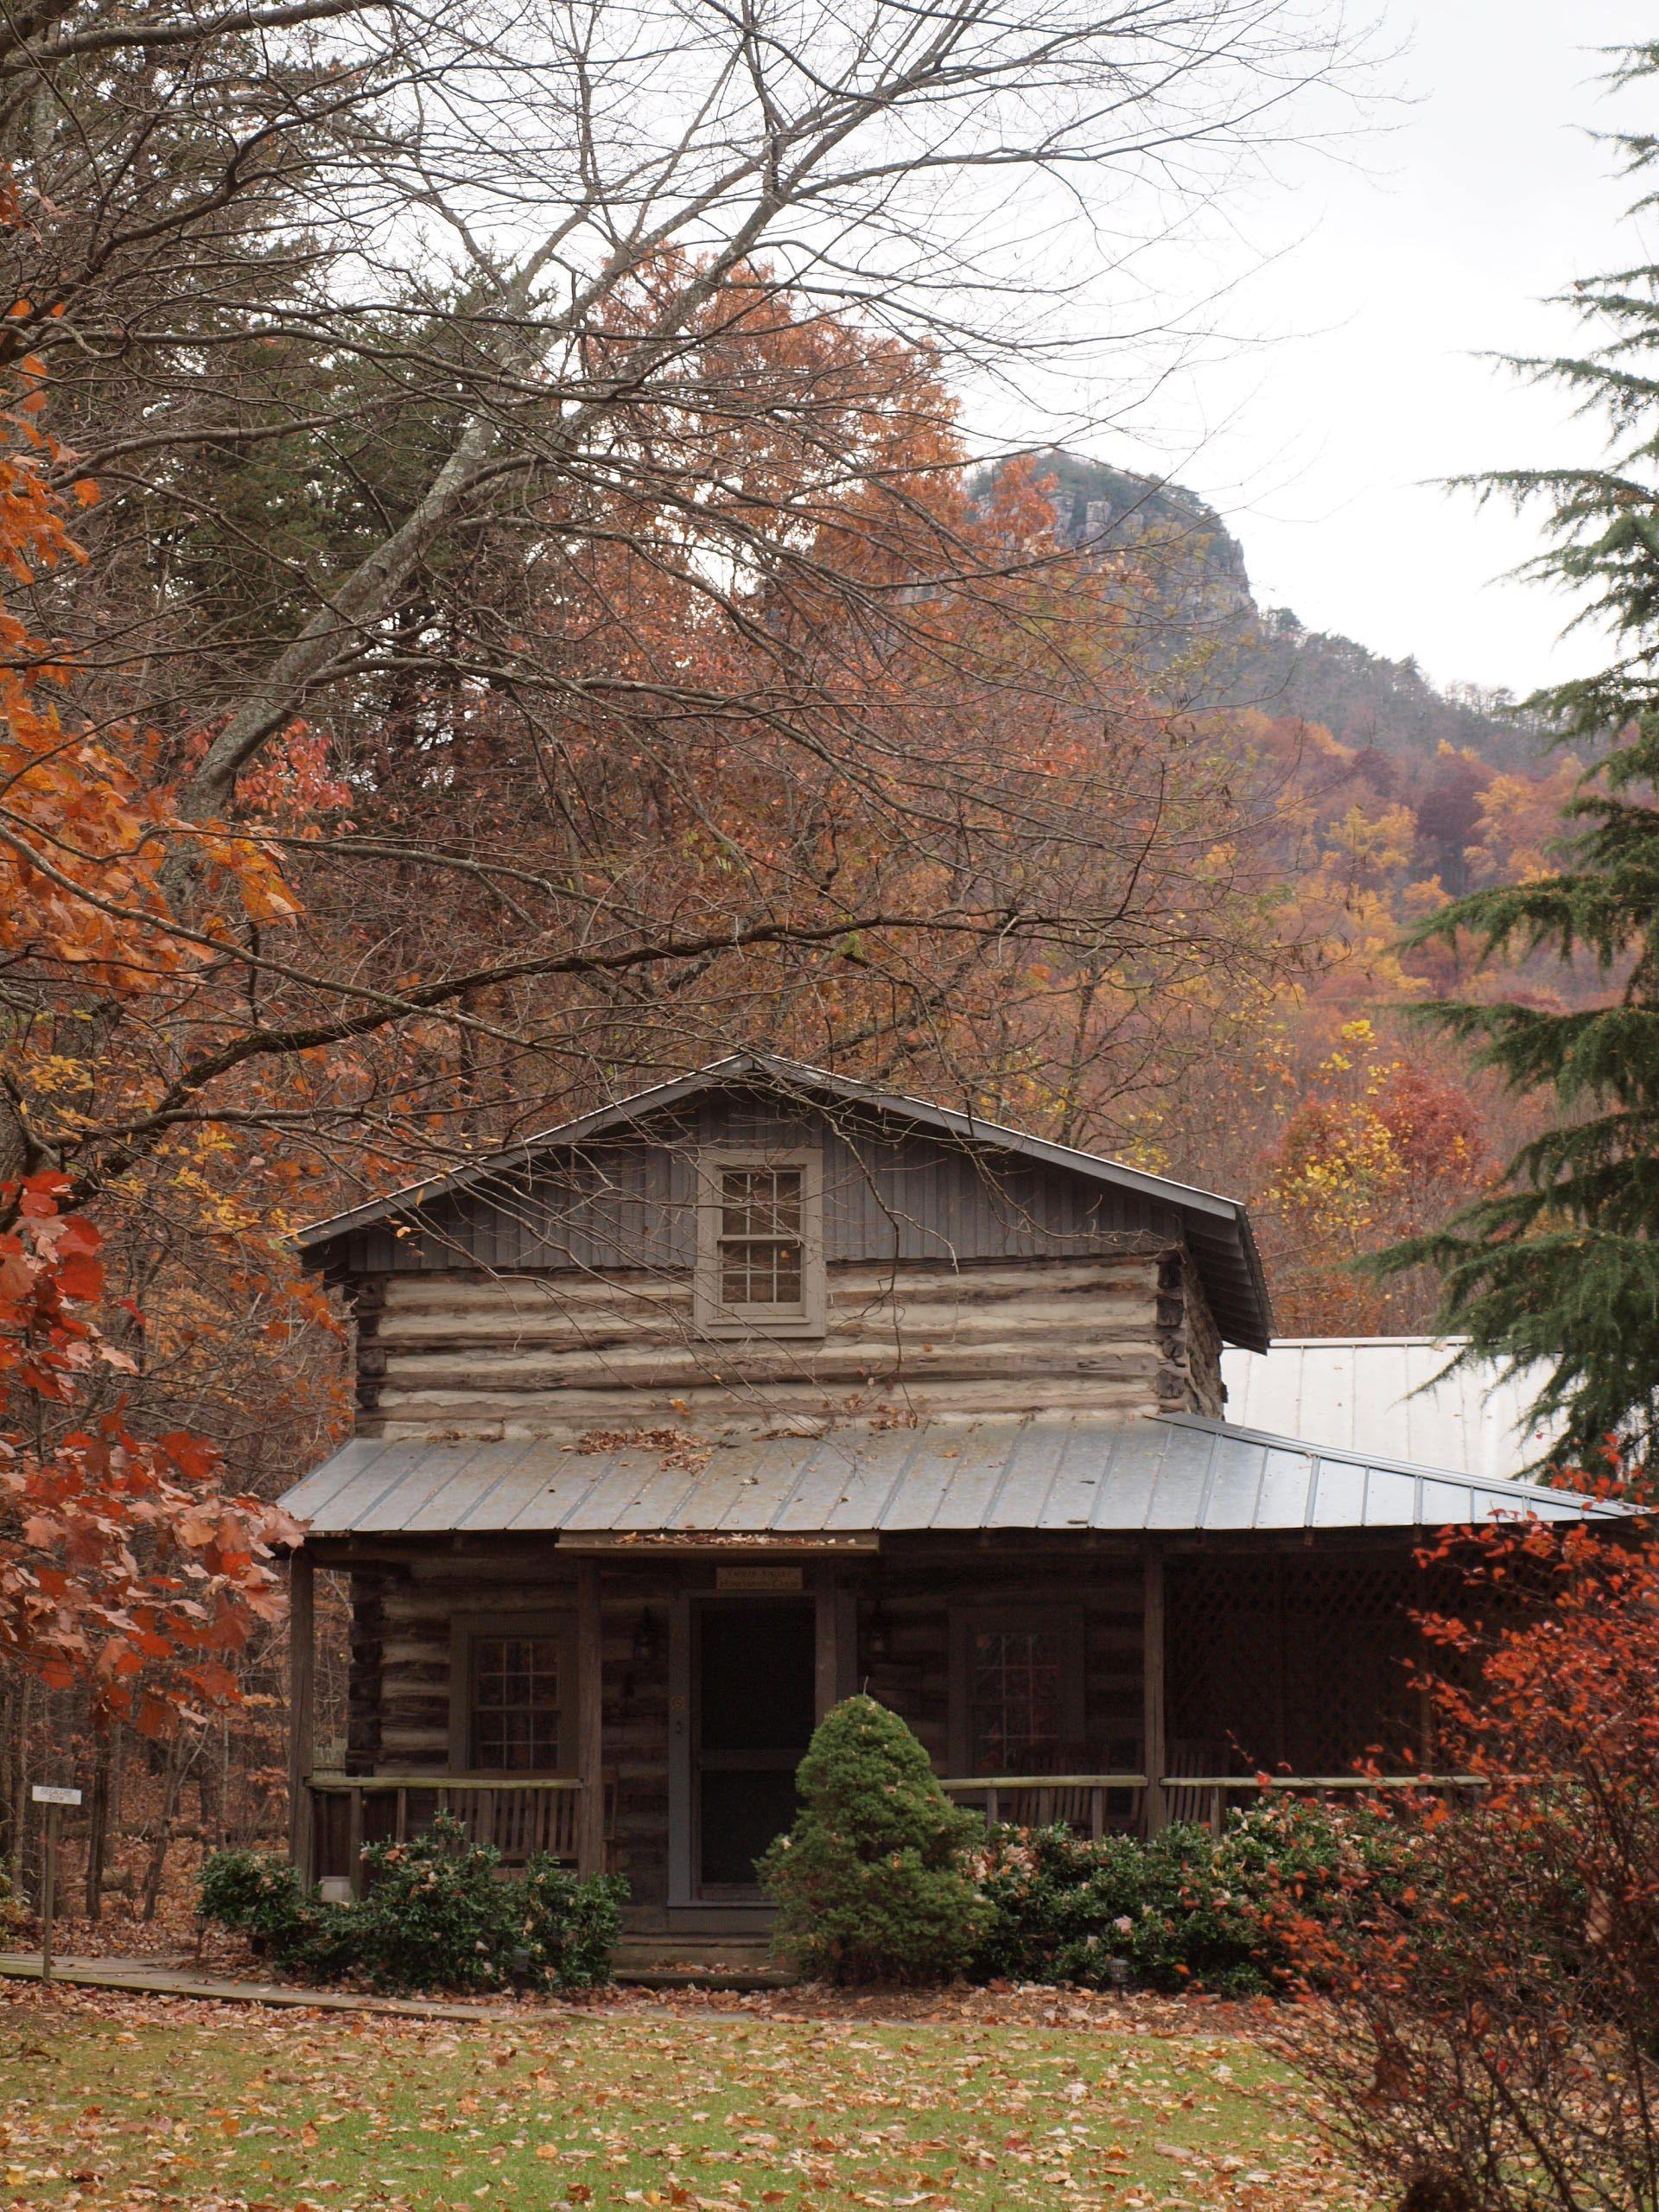 year old tobacco barn converted into a cabin north carolina